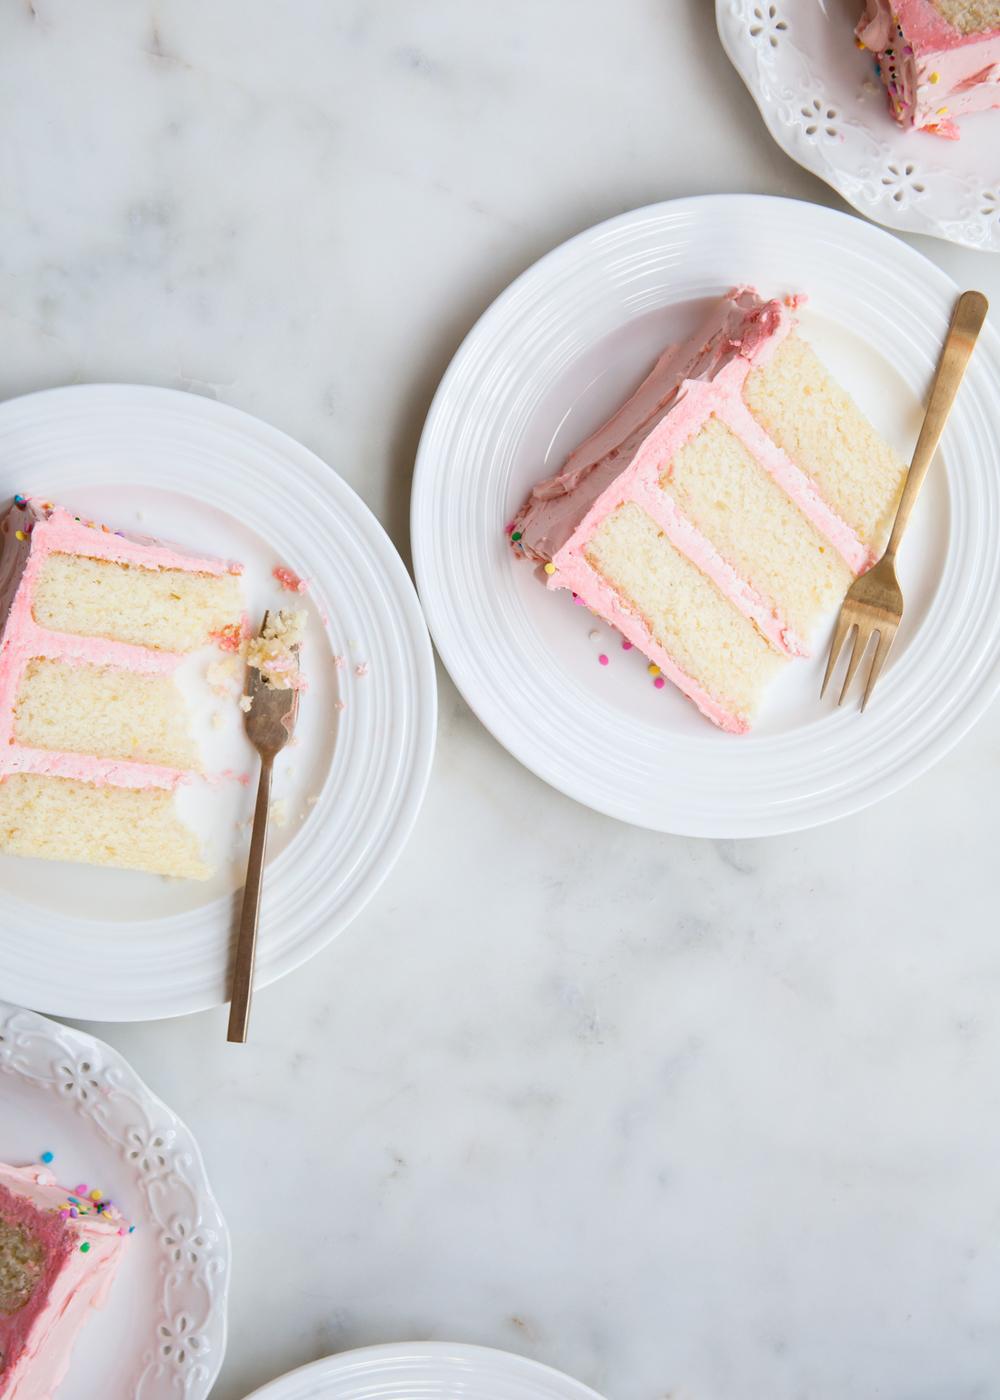 How to make Swiss meringue buttercream + a video tutorial.